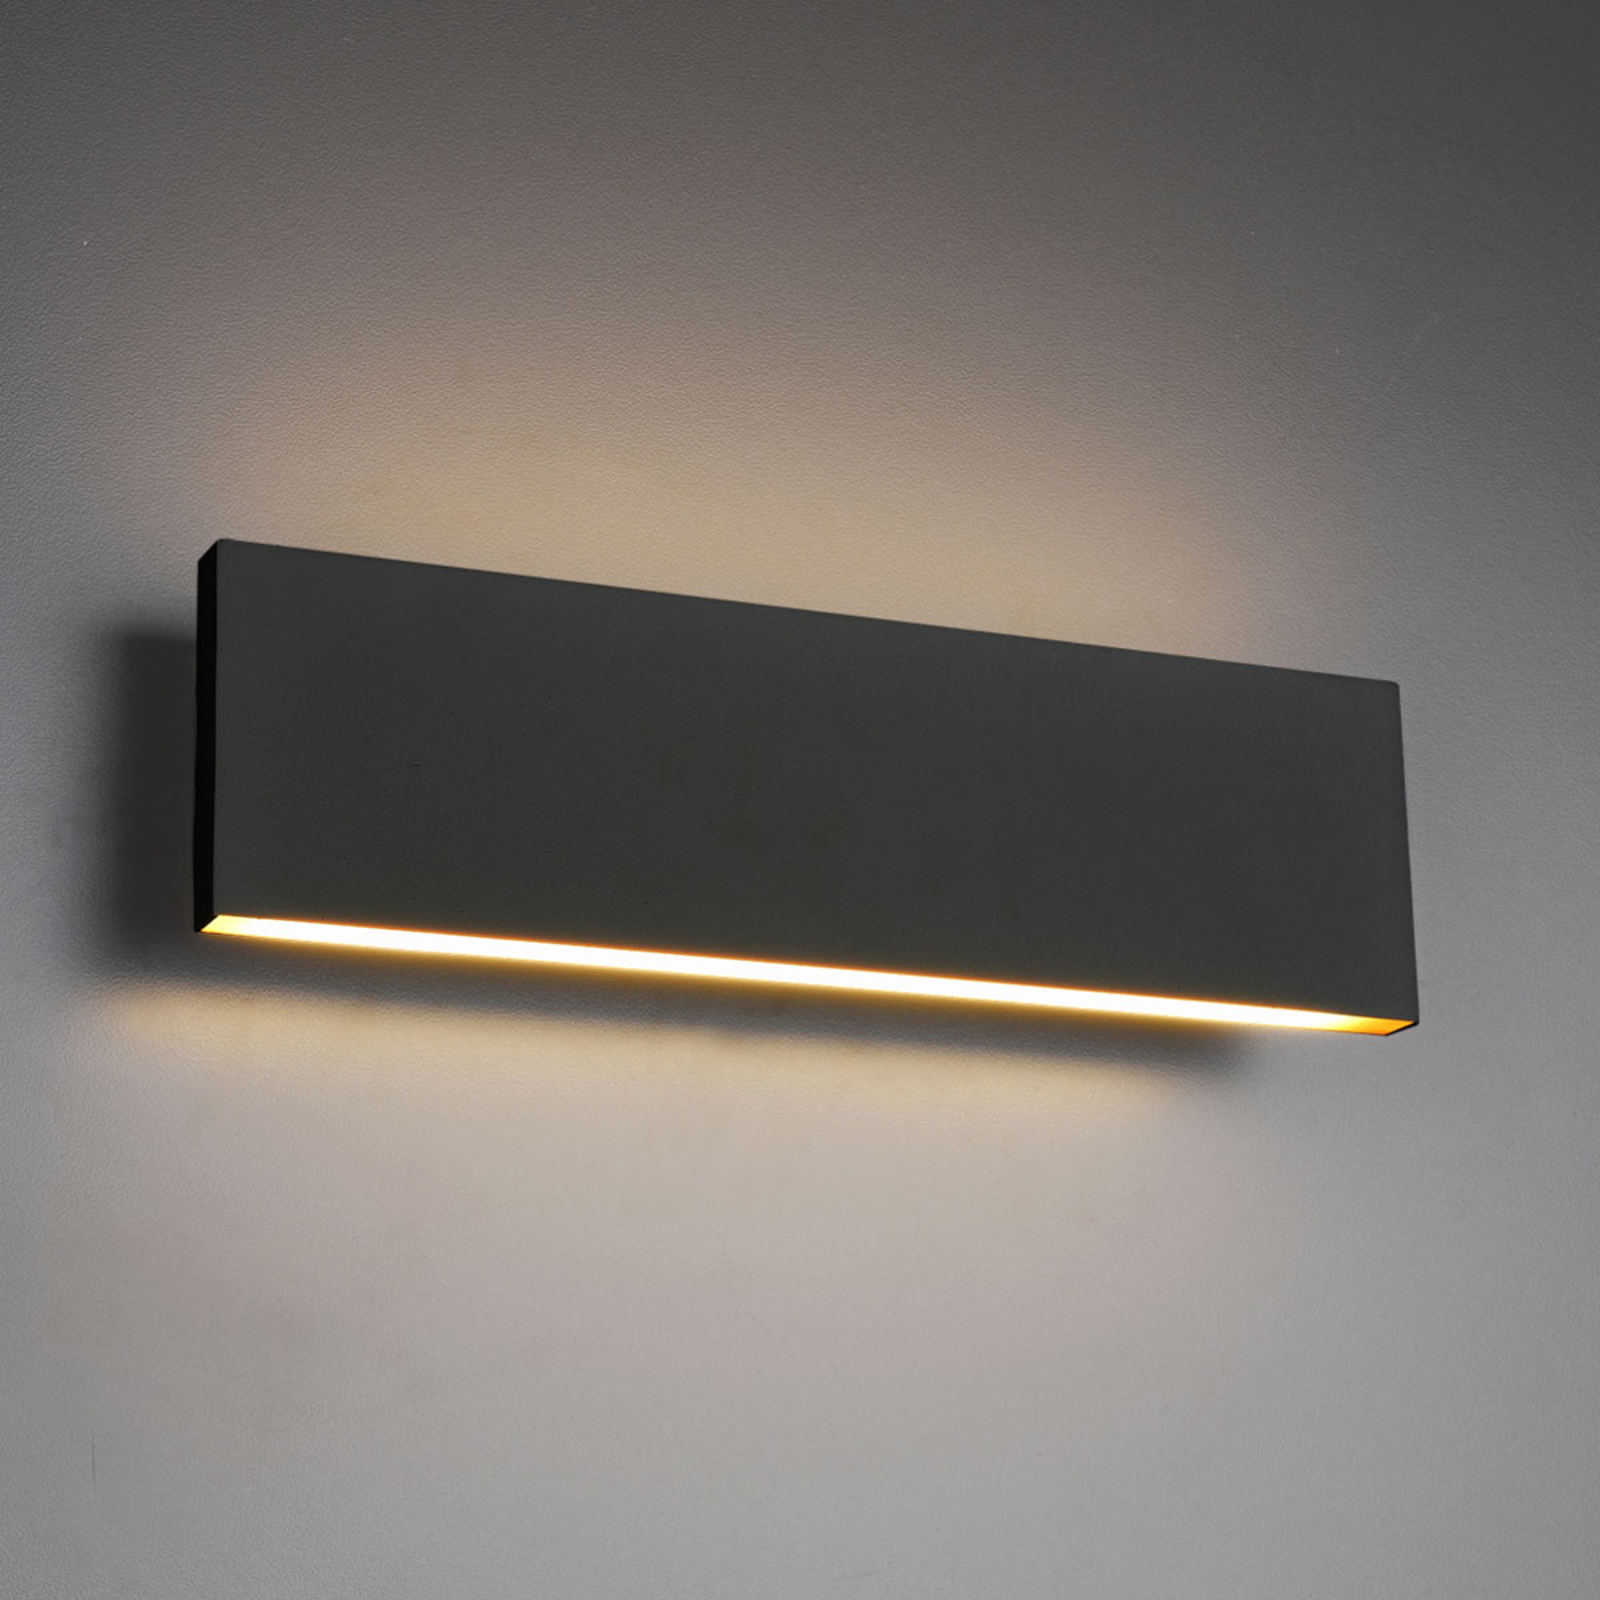 Applique LED Concha 28cm, anthracite